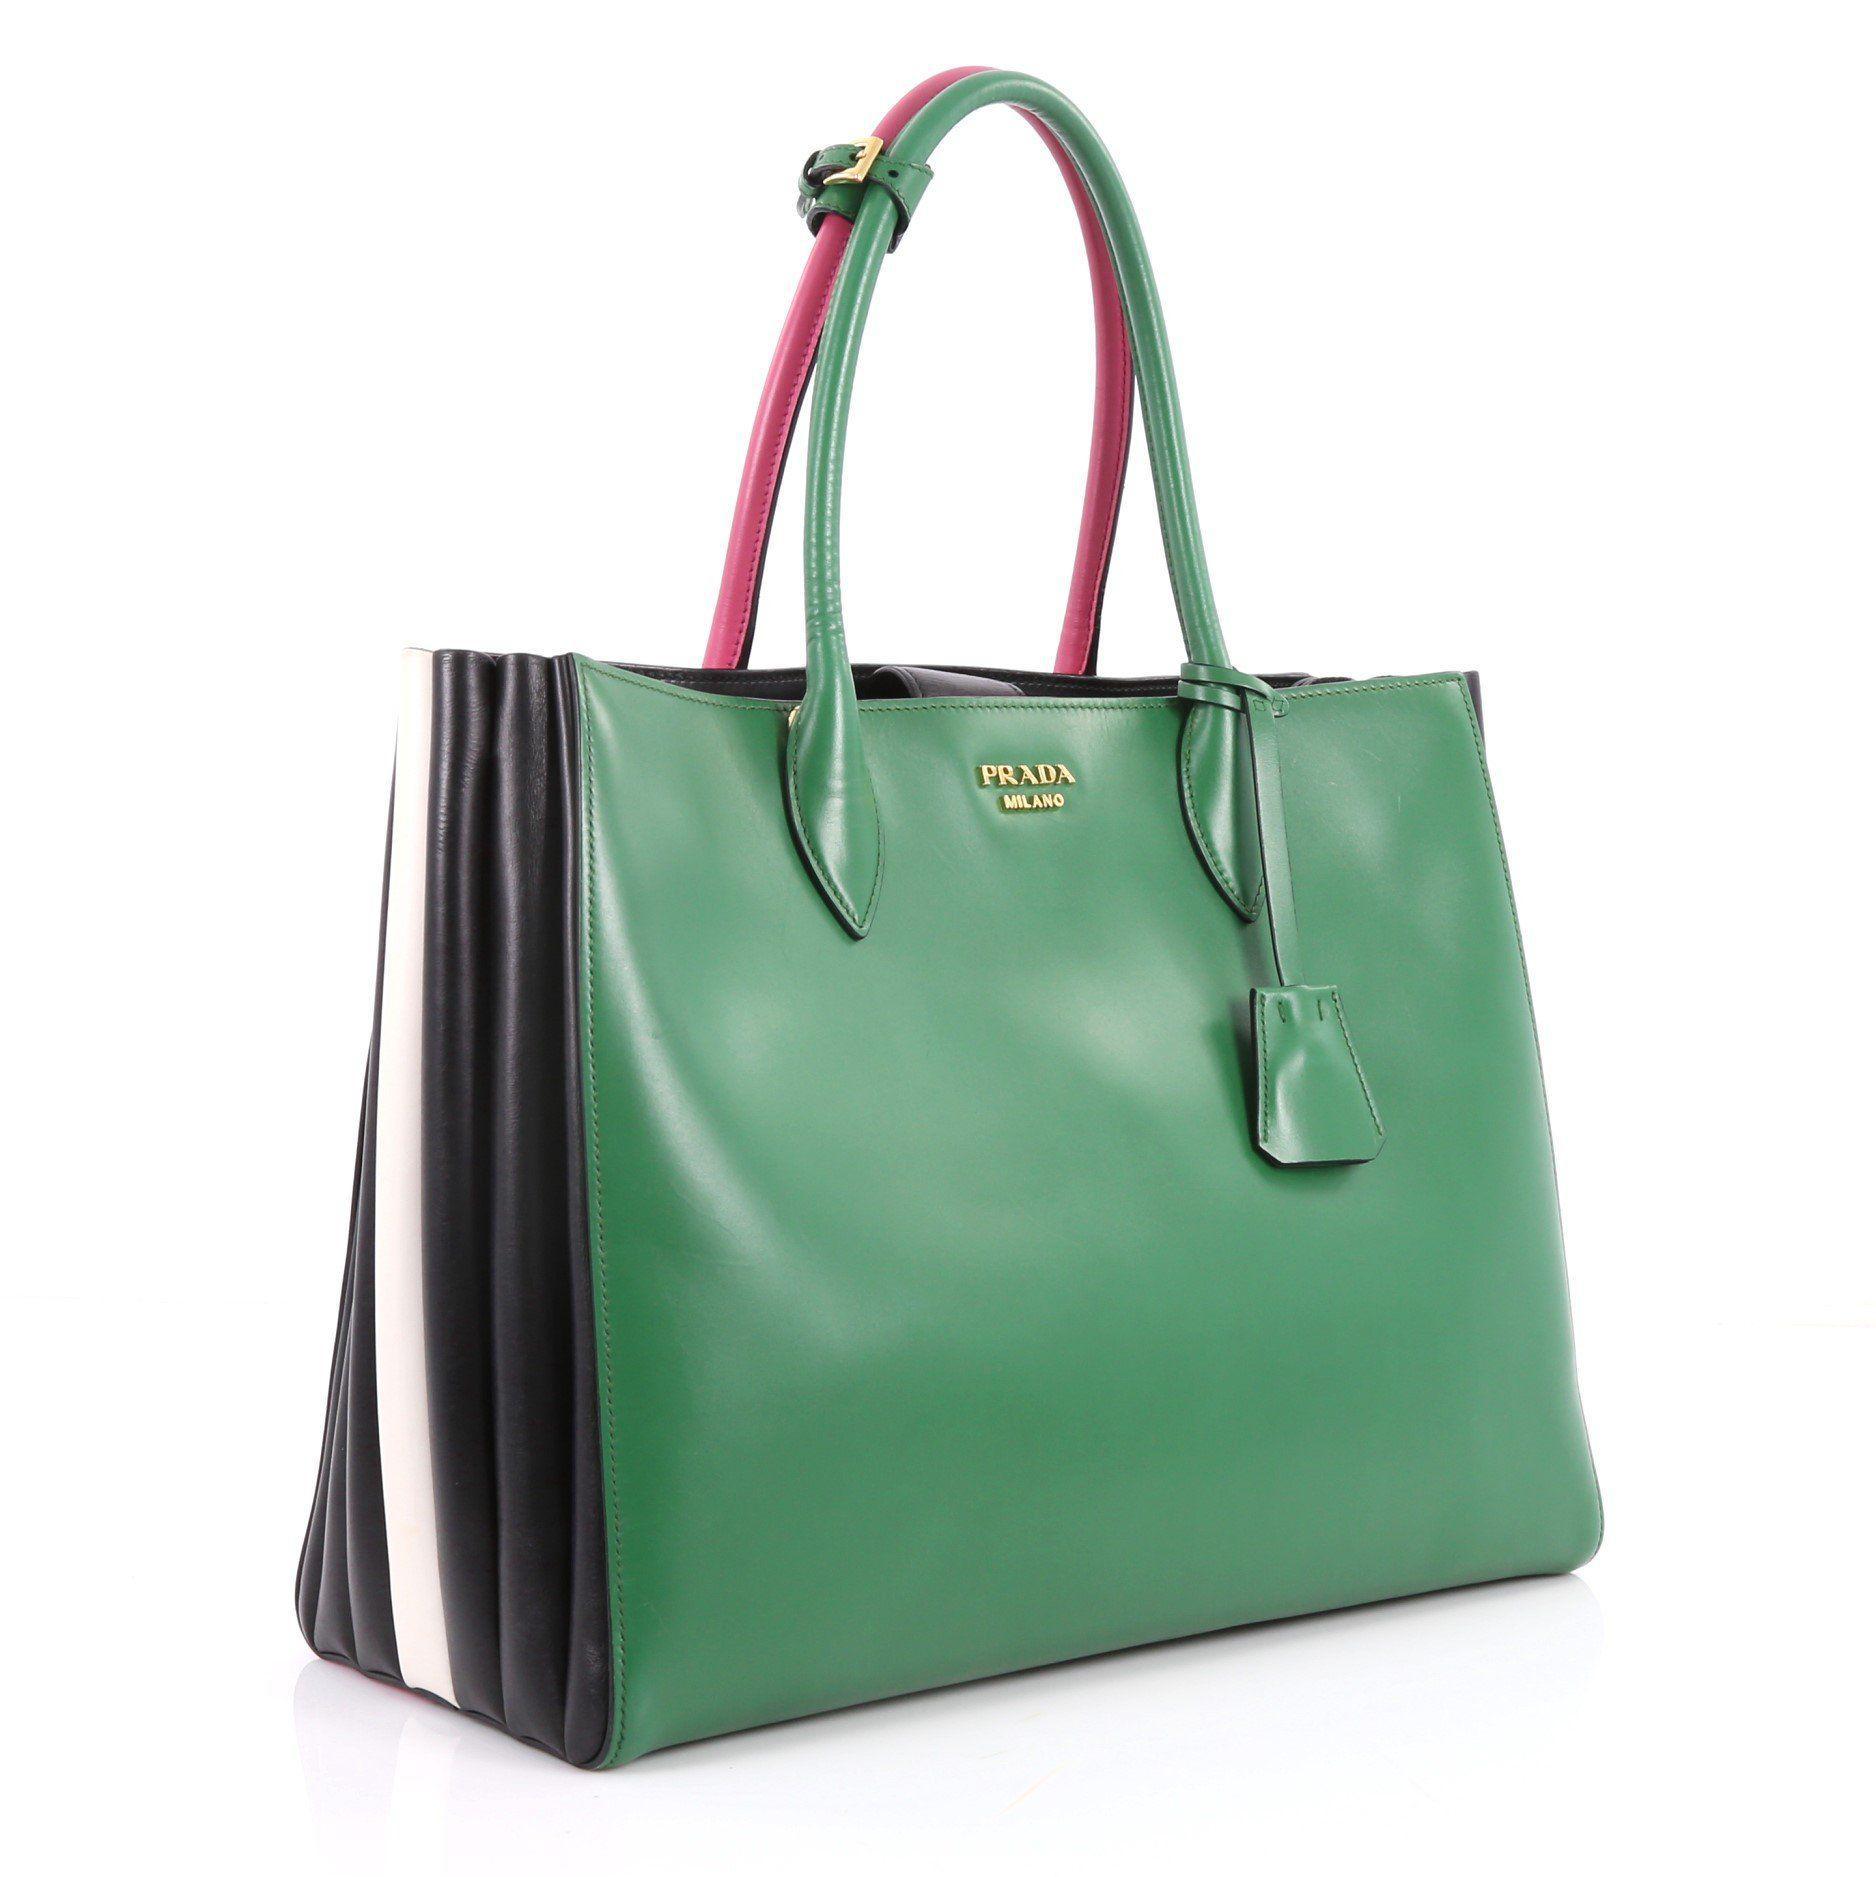 a088e4ead667 Prada - Green Pre Owned Soft Bibliotheque Handbag City Calfskin Large -  Lyst. View fullscreen